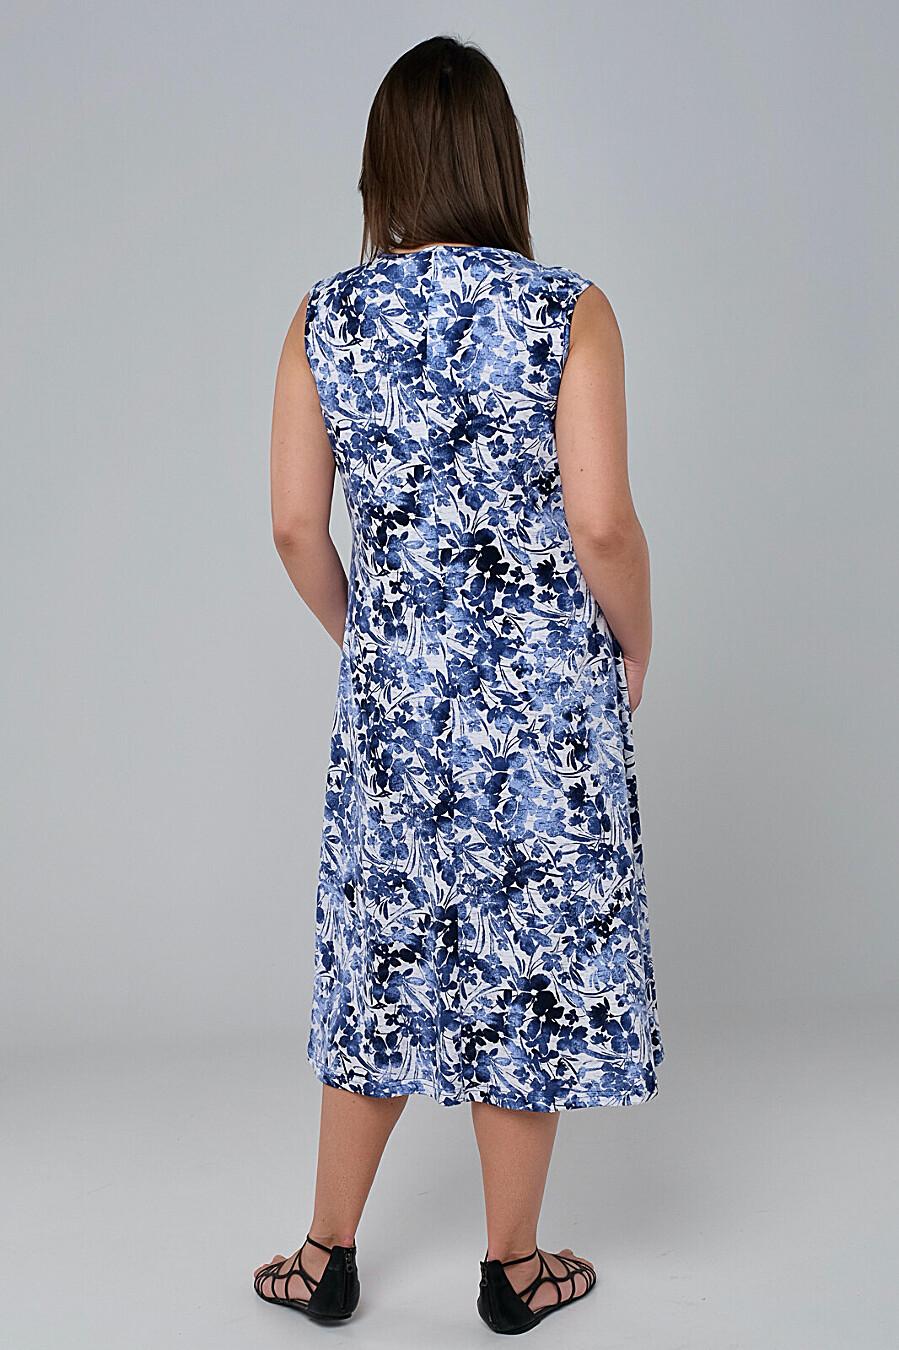 Сарафан ODEVAITE (308450), купить в Moyo.moda